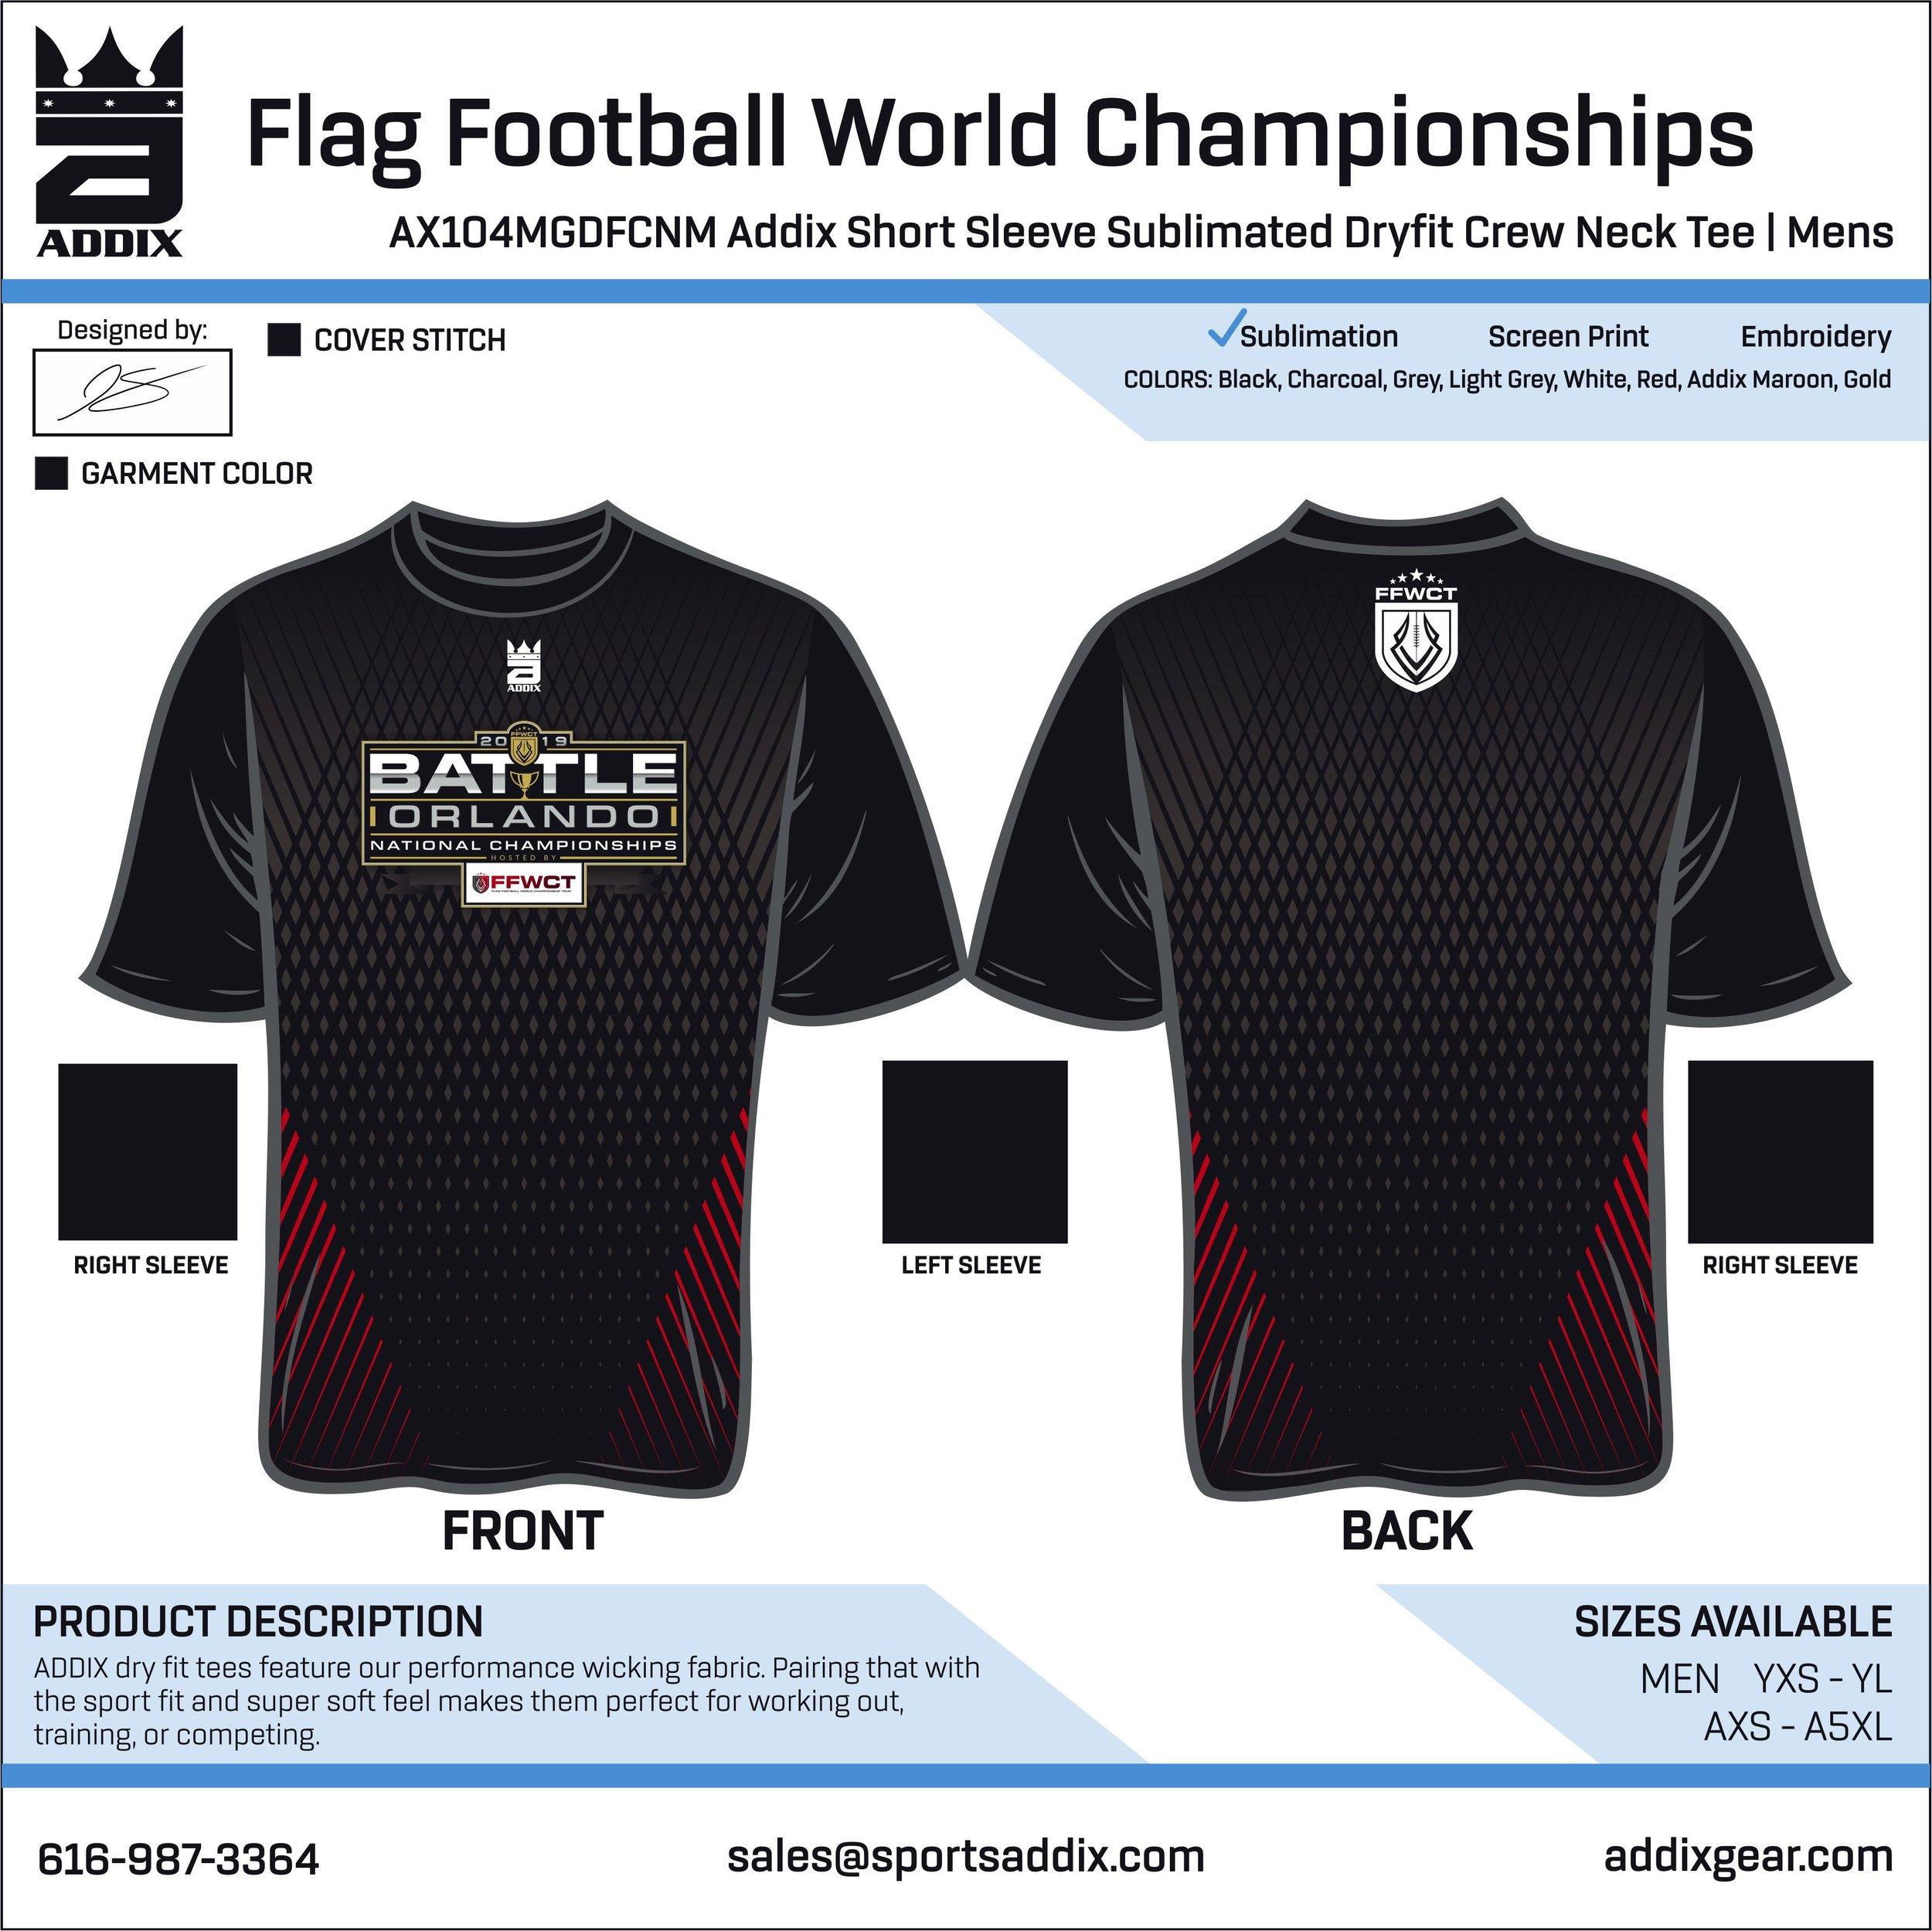 Flag Football World Championships_2018_12-28_JE_SS Full Sub DF.jpg